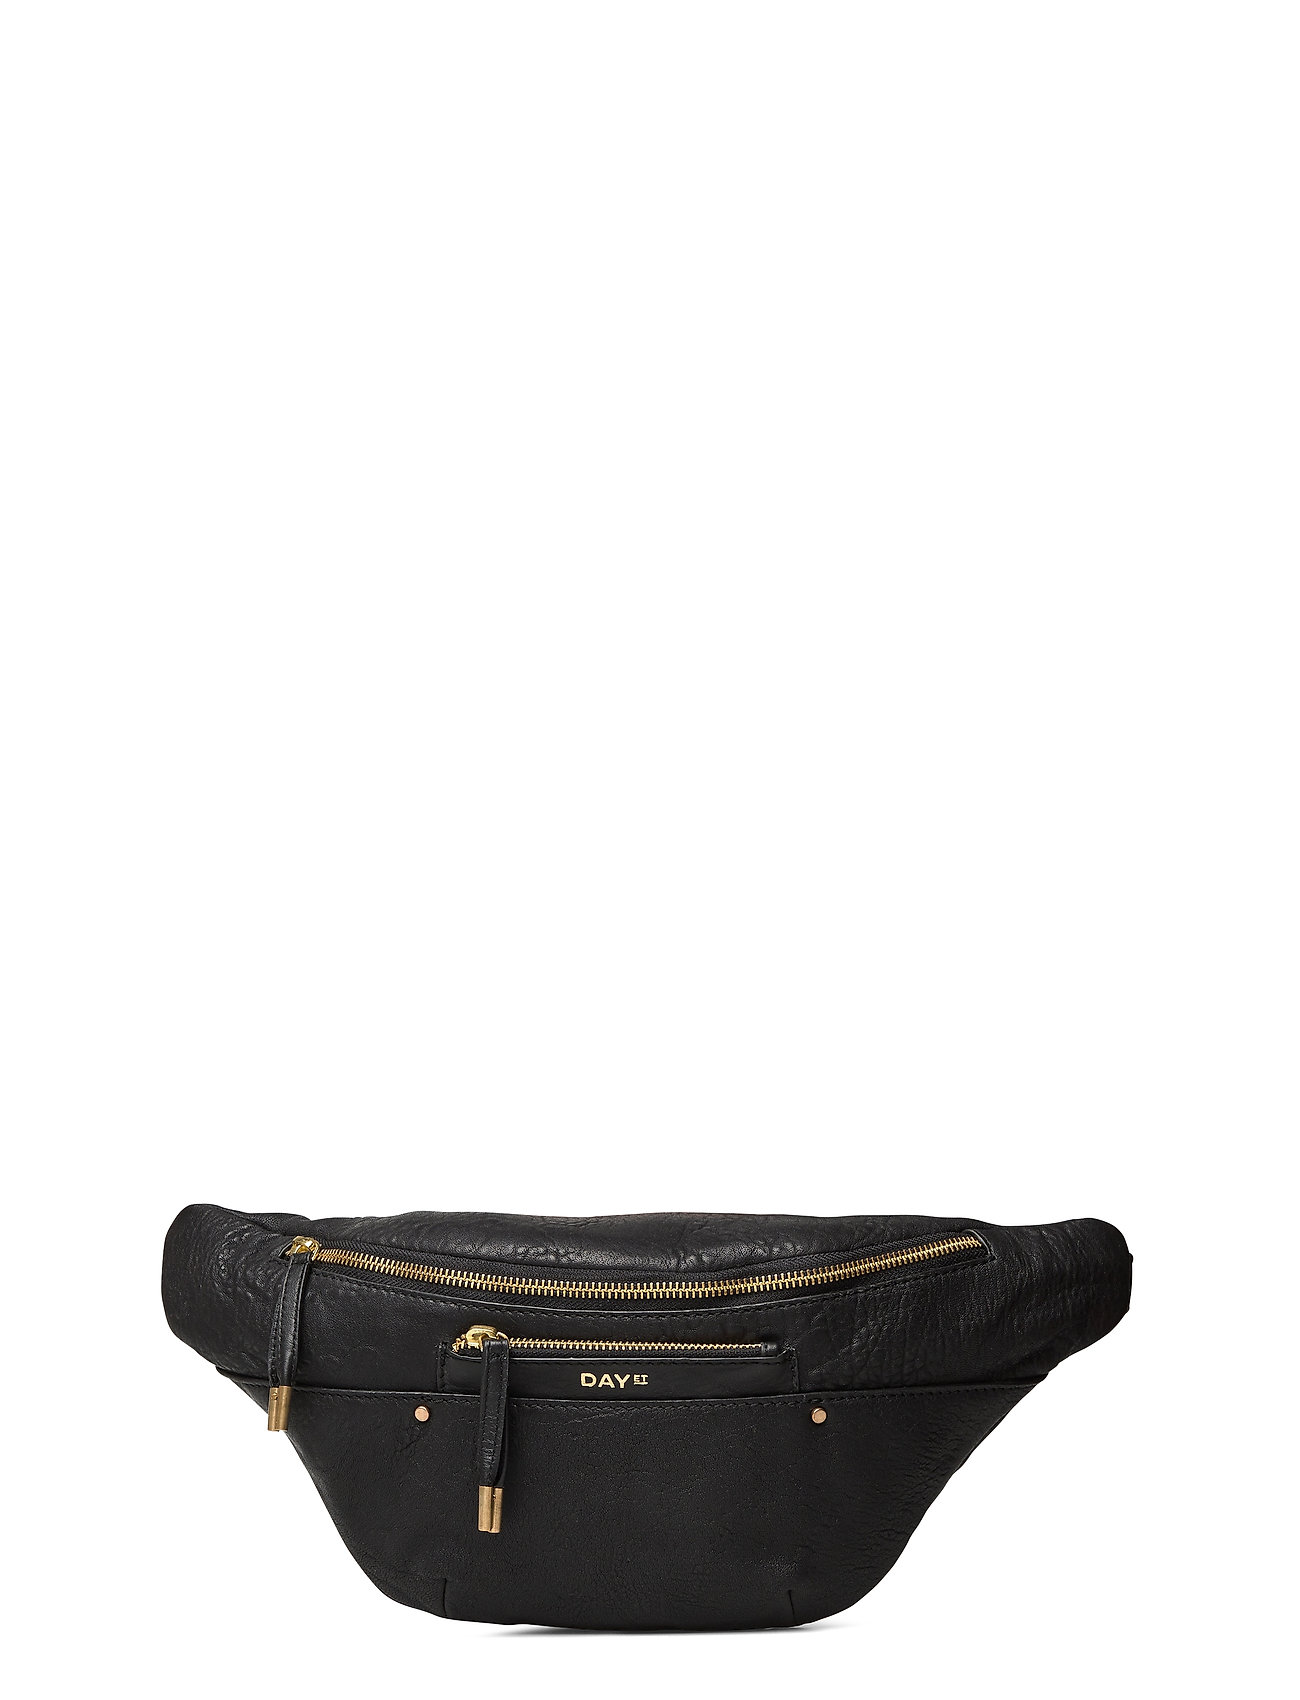 Image of Day Bubbly Leather Bum Bum Bag Taske Sort DAY Et (3446804031)